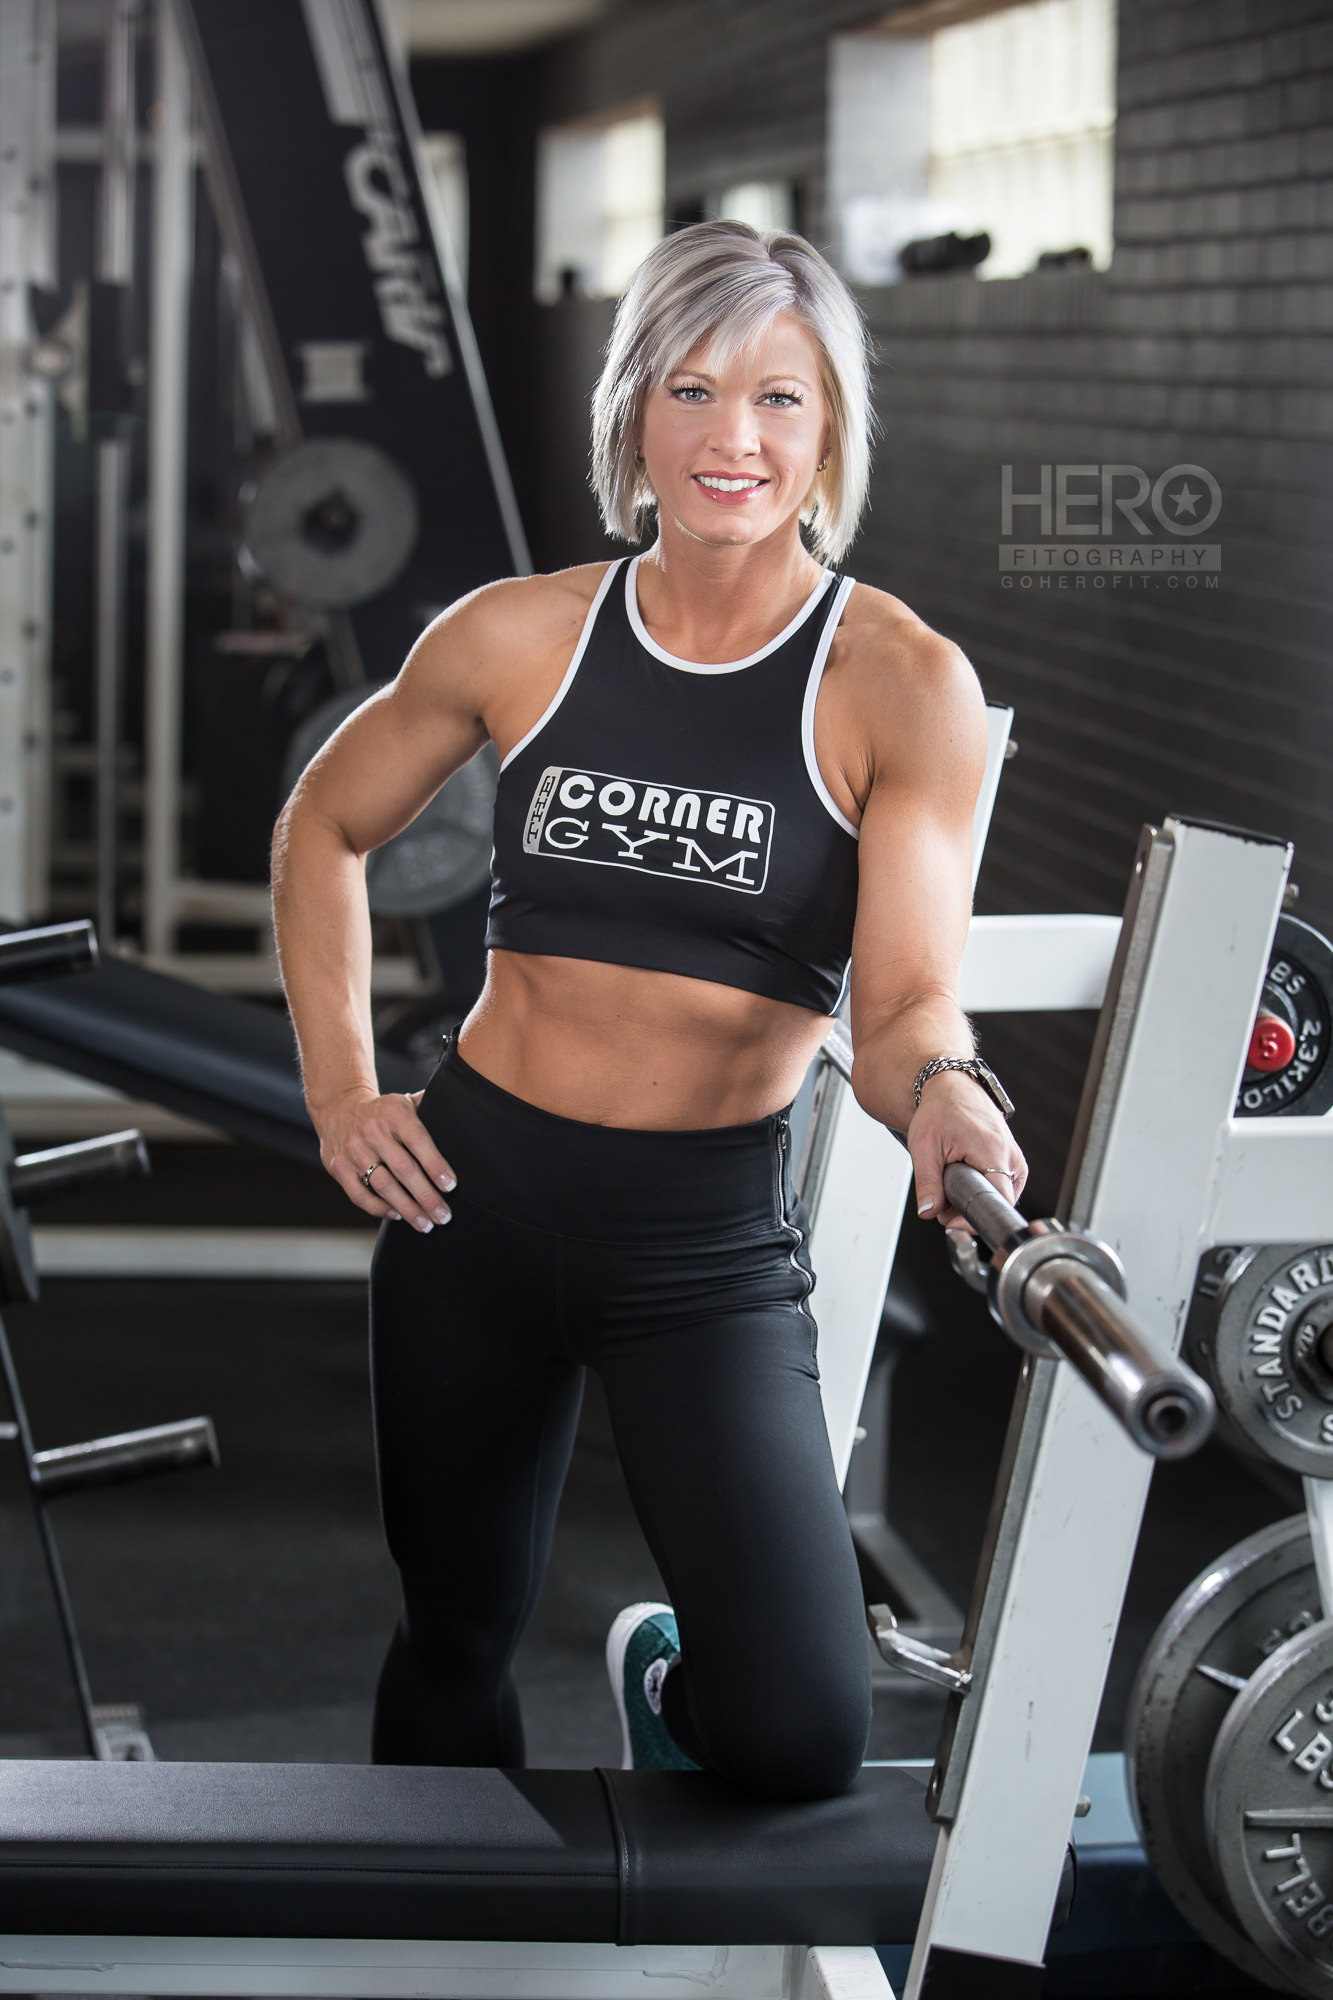 HF Stephanie K - Corner Gym-9890.jpg